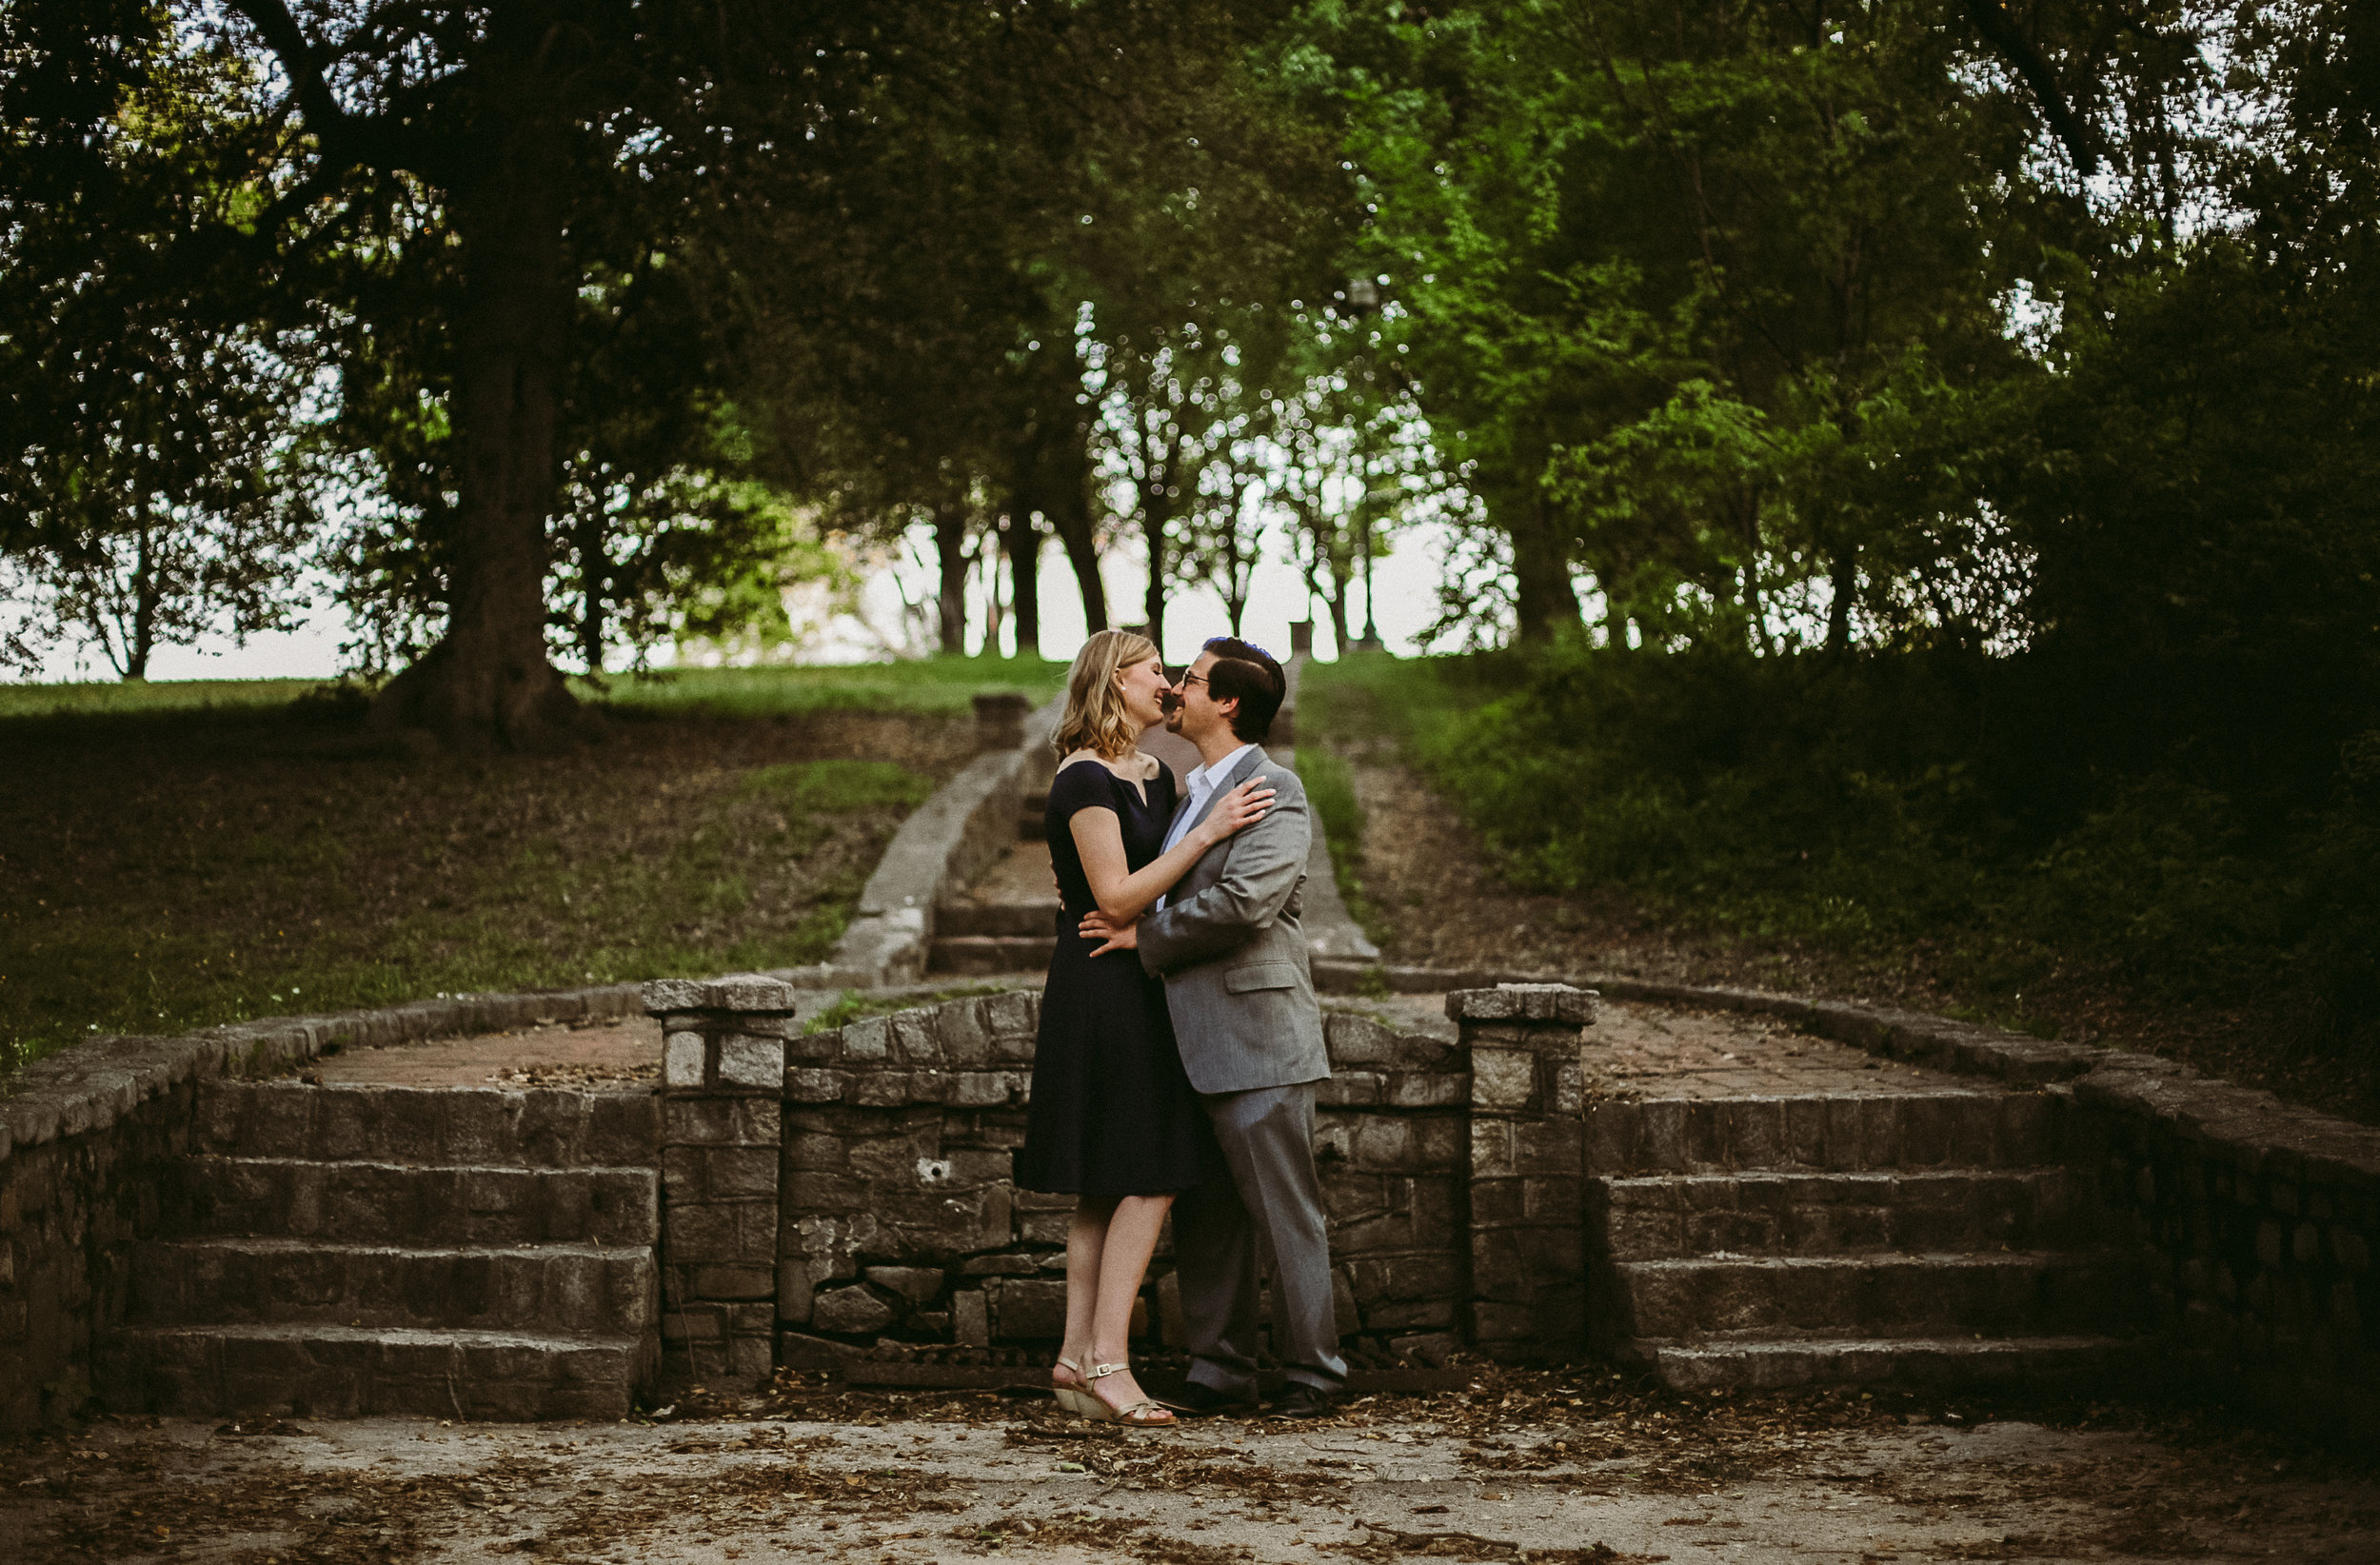 Stephanieandtommyjoe.richmondvirginia.foresthillpark.engagementsession.rebeccaburtphotography-68.jpg